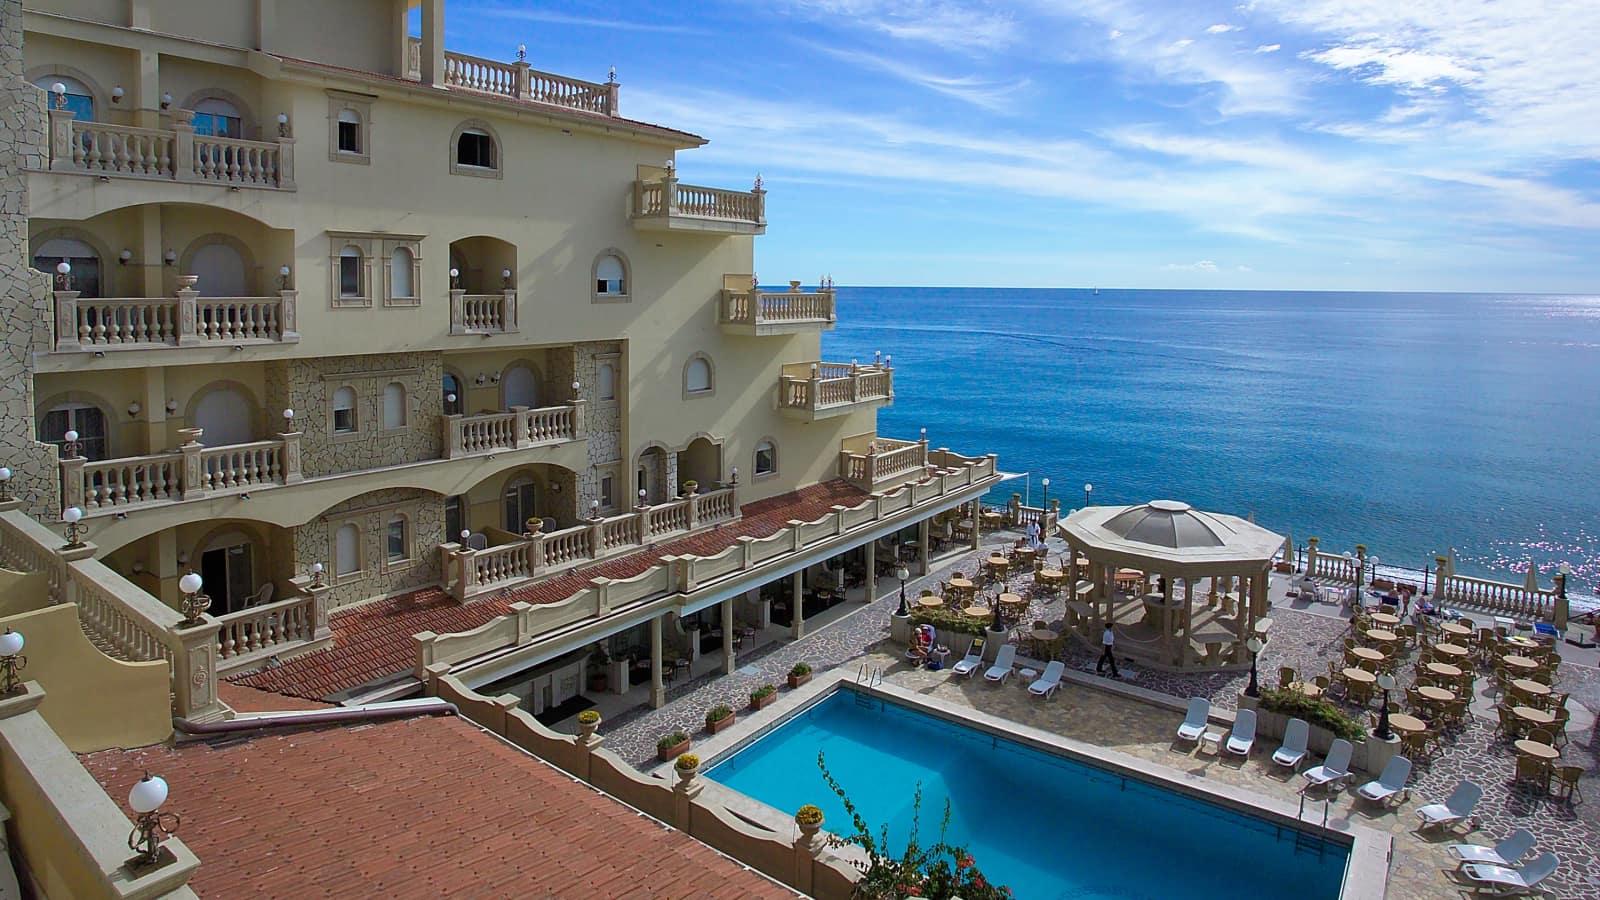 Hotel hellenia yachting giardini naxos sicily topflight for Giardini naxos sicilia